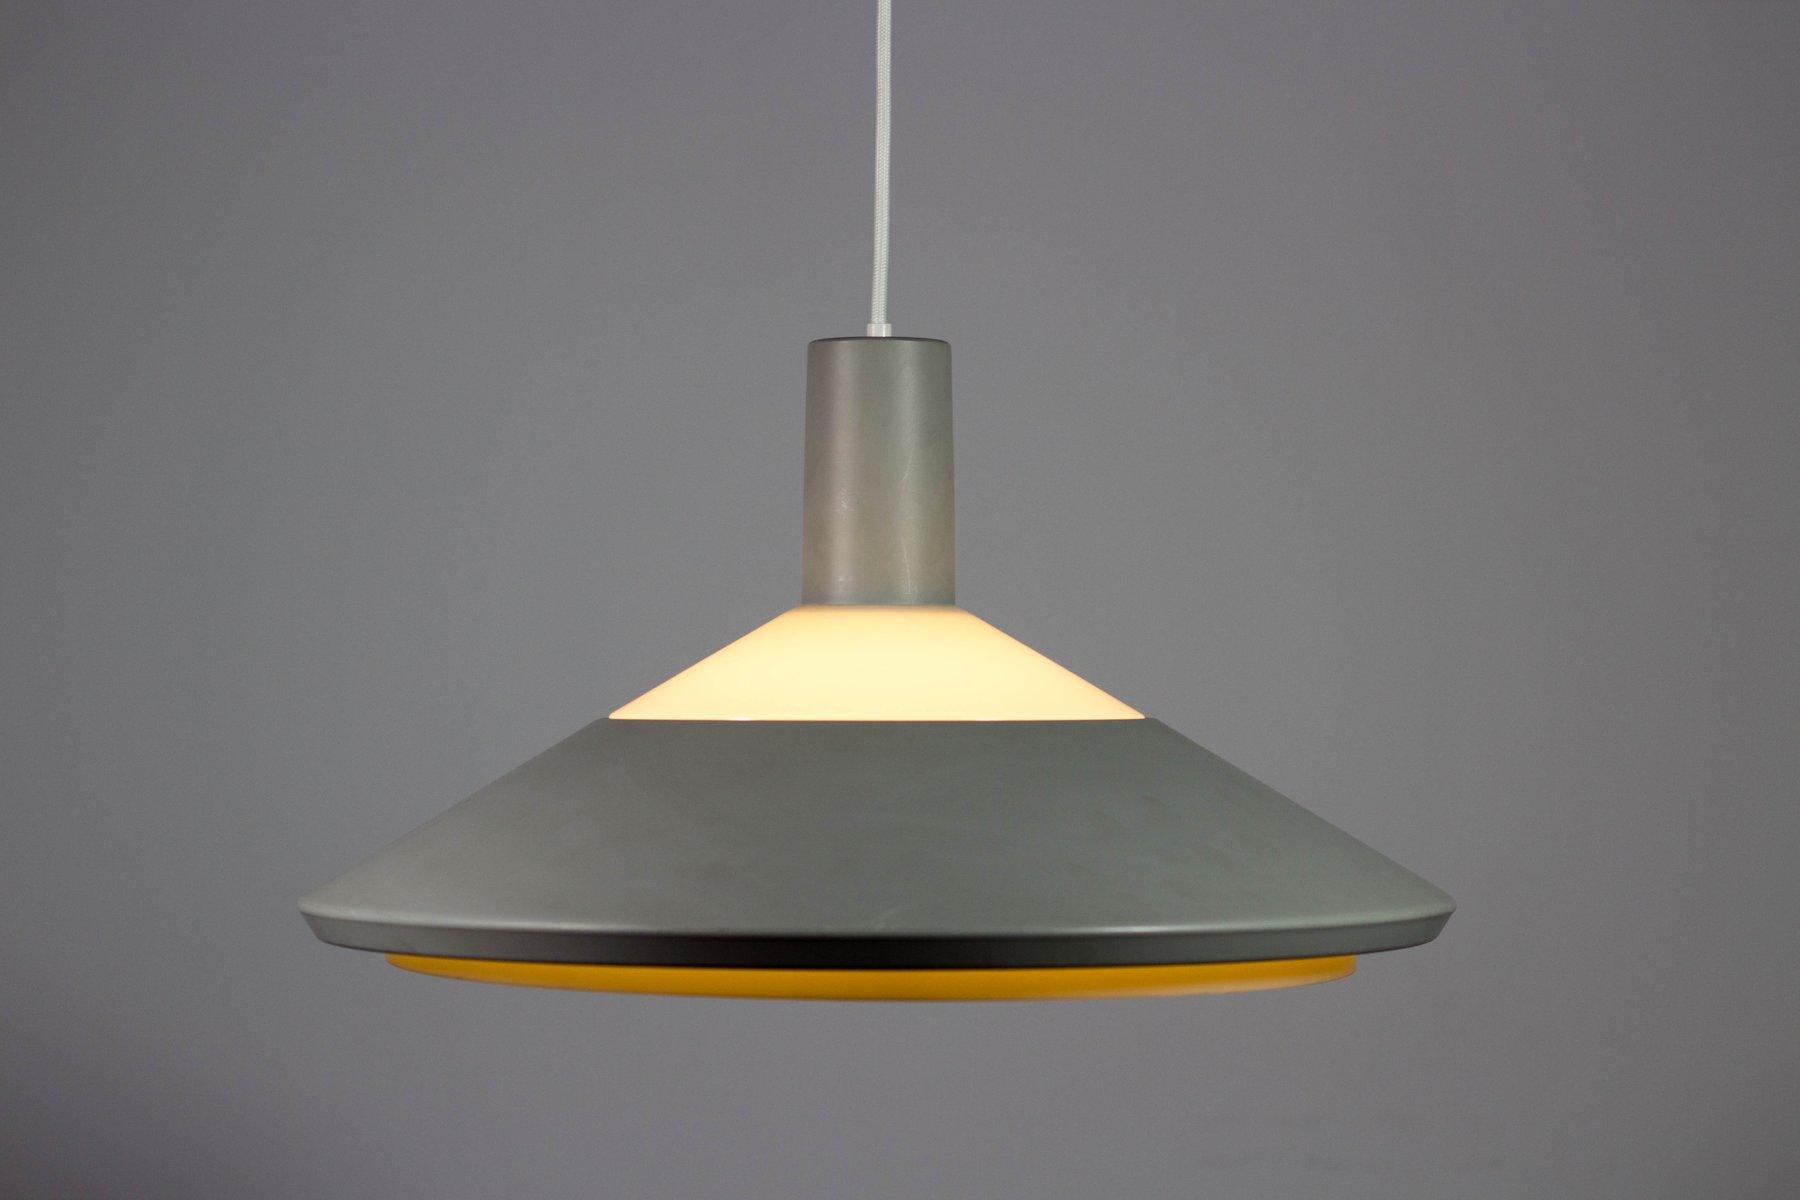 vintage klassependel lampe von louis poulsen bei pamono kaufen. Black Bedroom Furniture Sets. Home Design Ideas